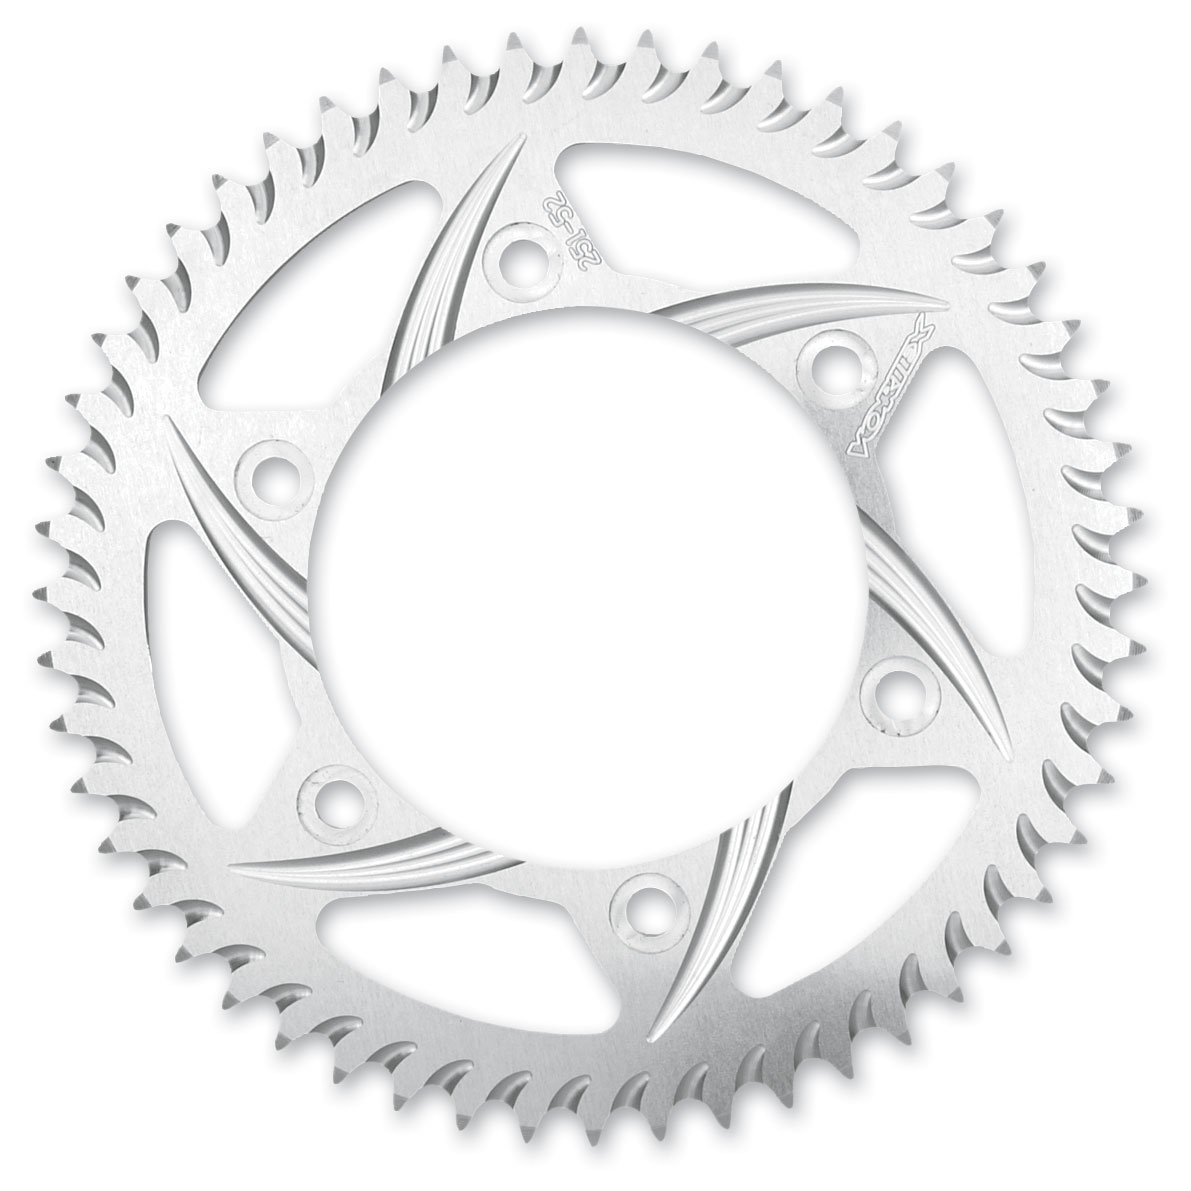 vortex rear sprocket 525 43t silver 247 43 jpcycles 2015 Honda NC700X with Aftermarket Accessories vortex rear sprocket 525 43t silver